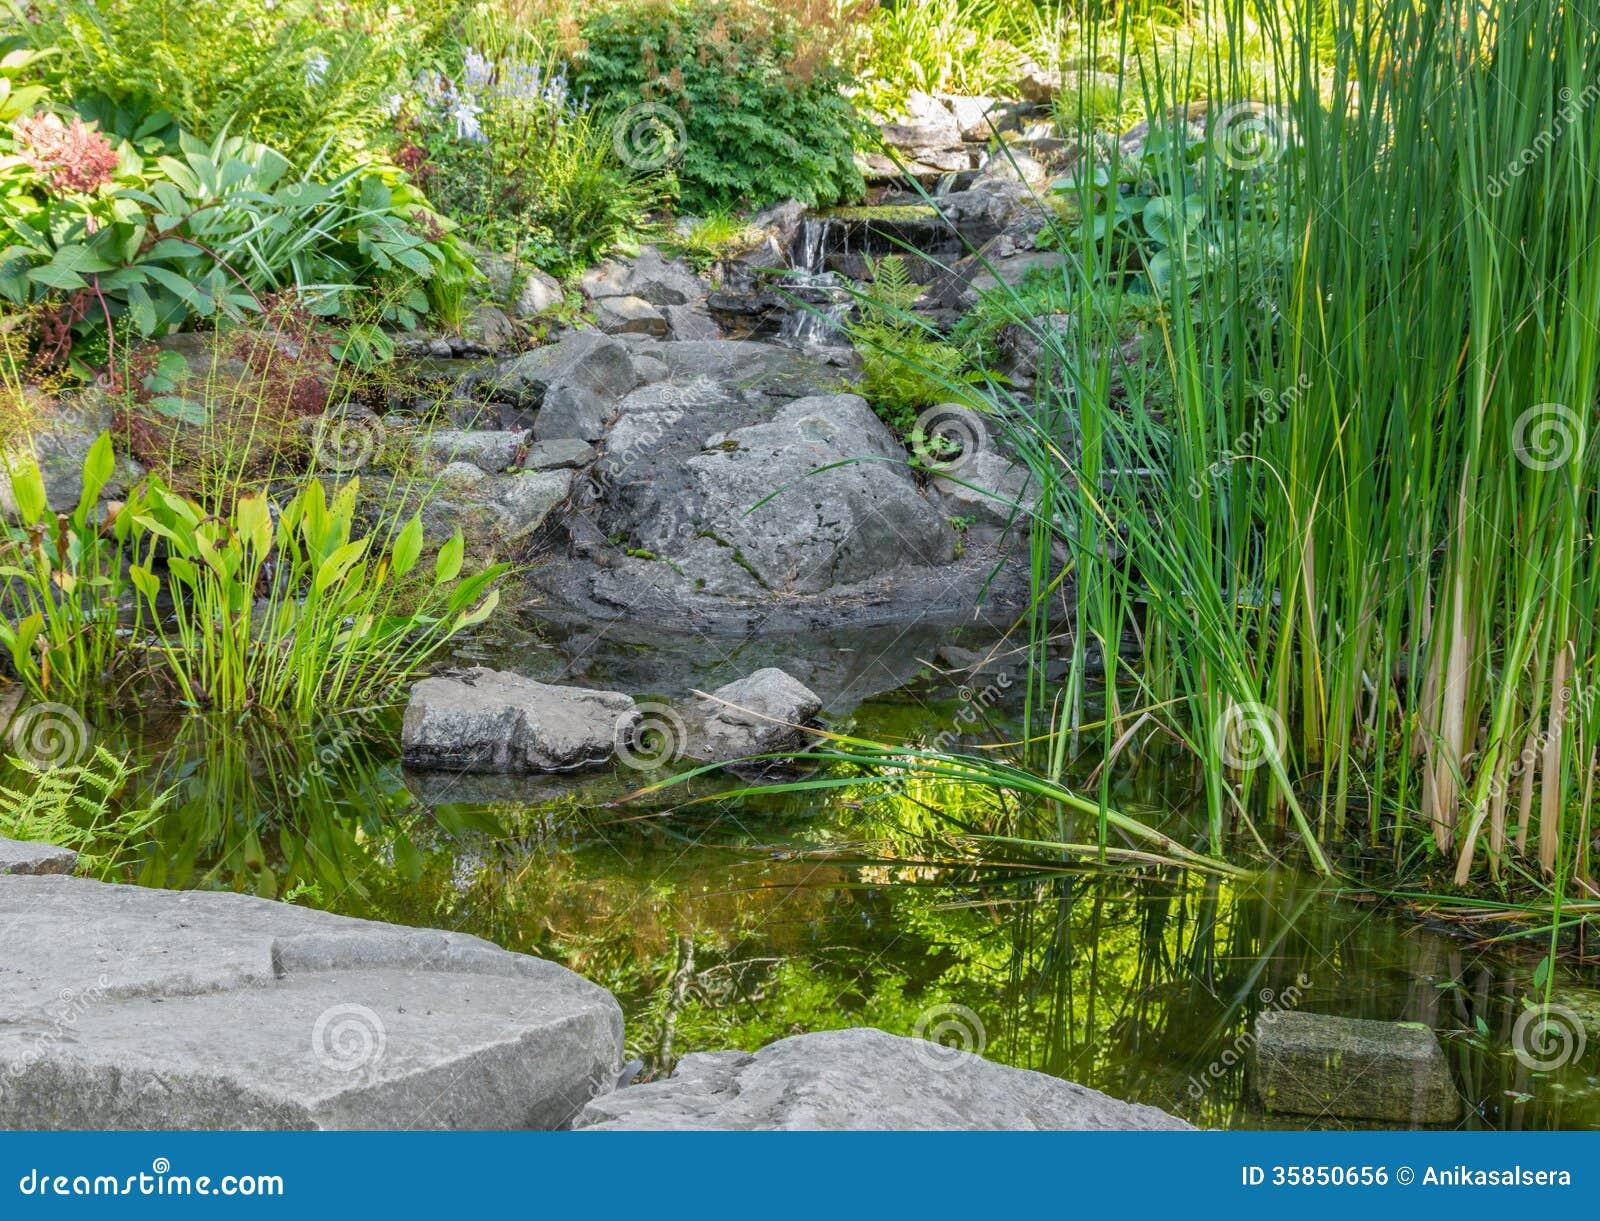 Faites du jardinage avec les plantes aquatiques l tang for Les plantes decoratives